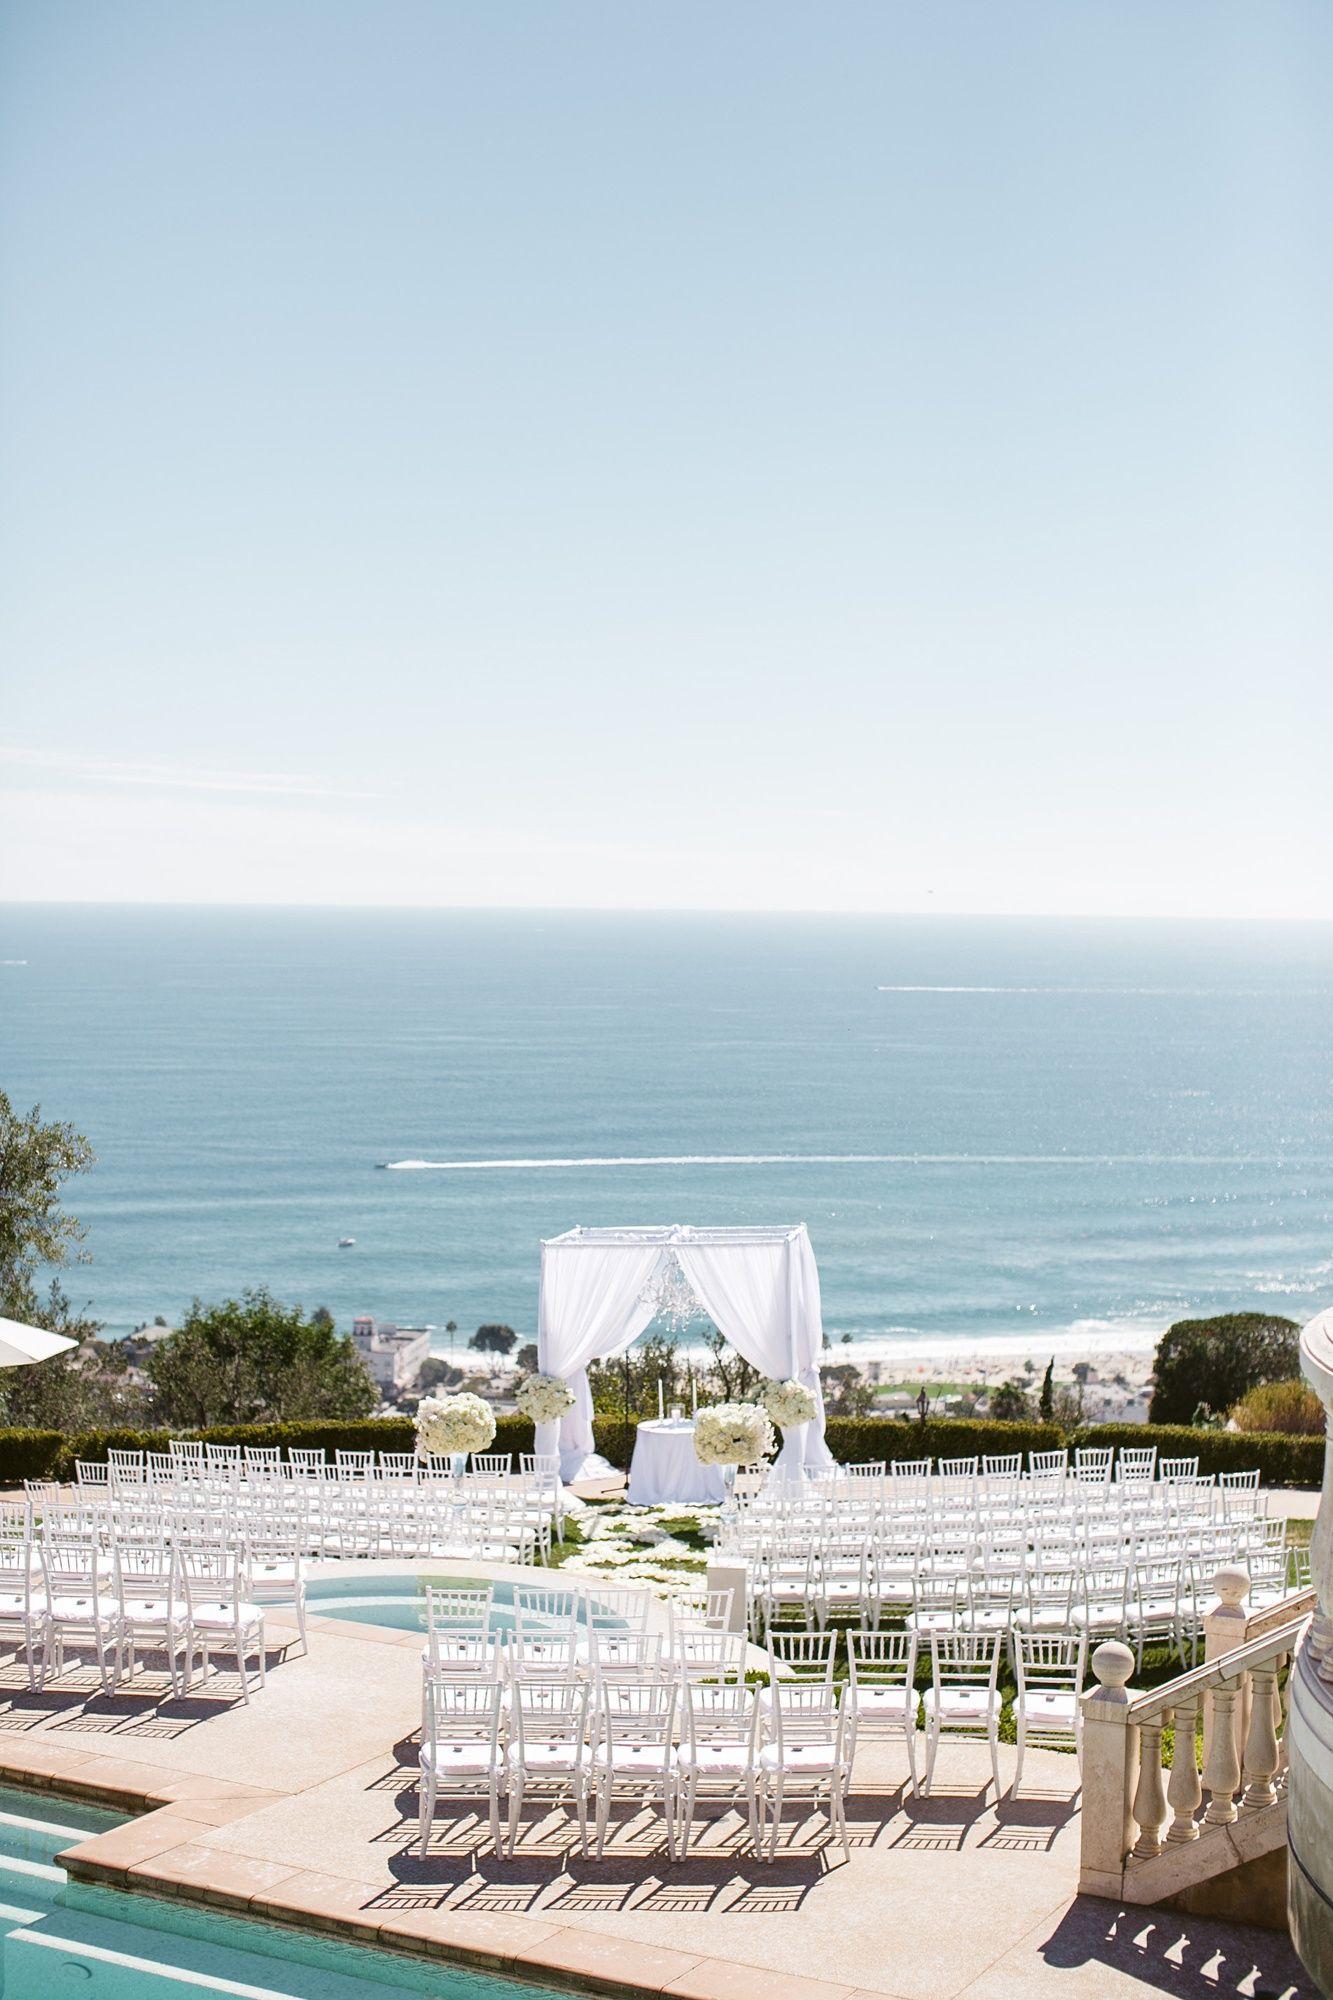 Teal beach wedding  An Elegant Seaside Wedding at Oceana Estate in Laguna Beach